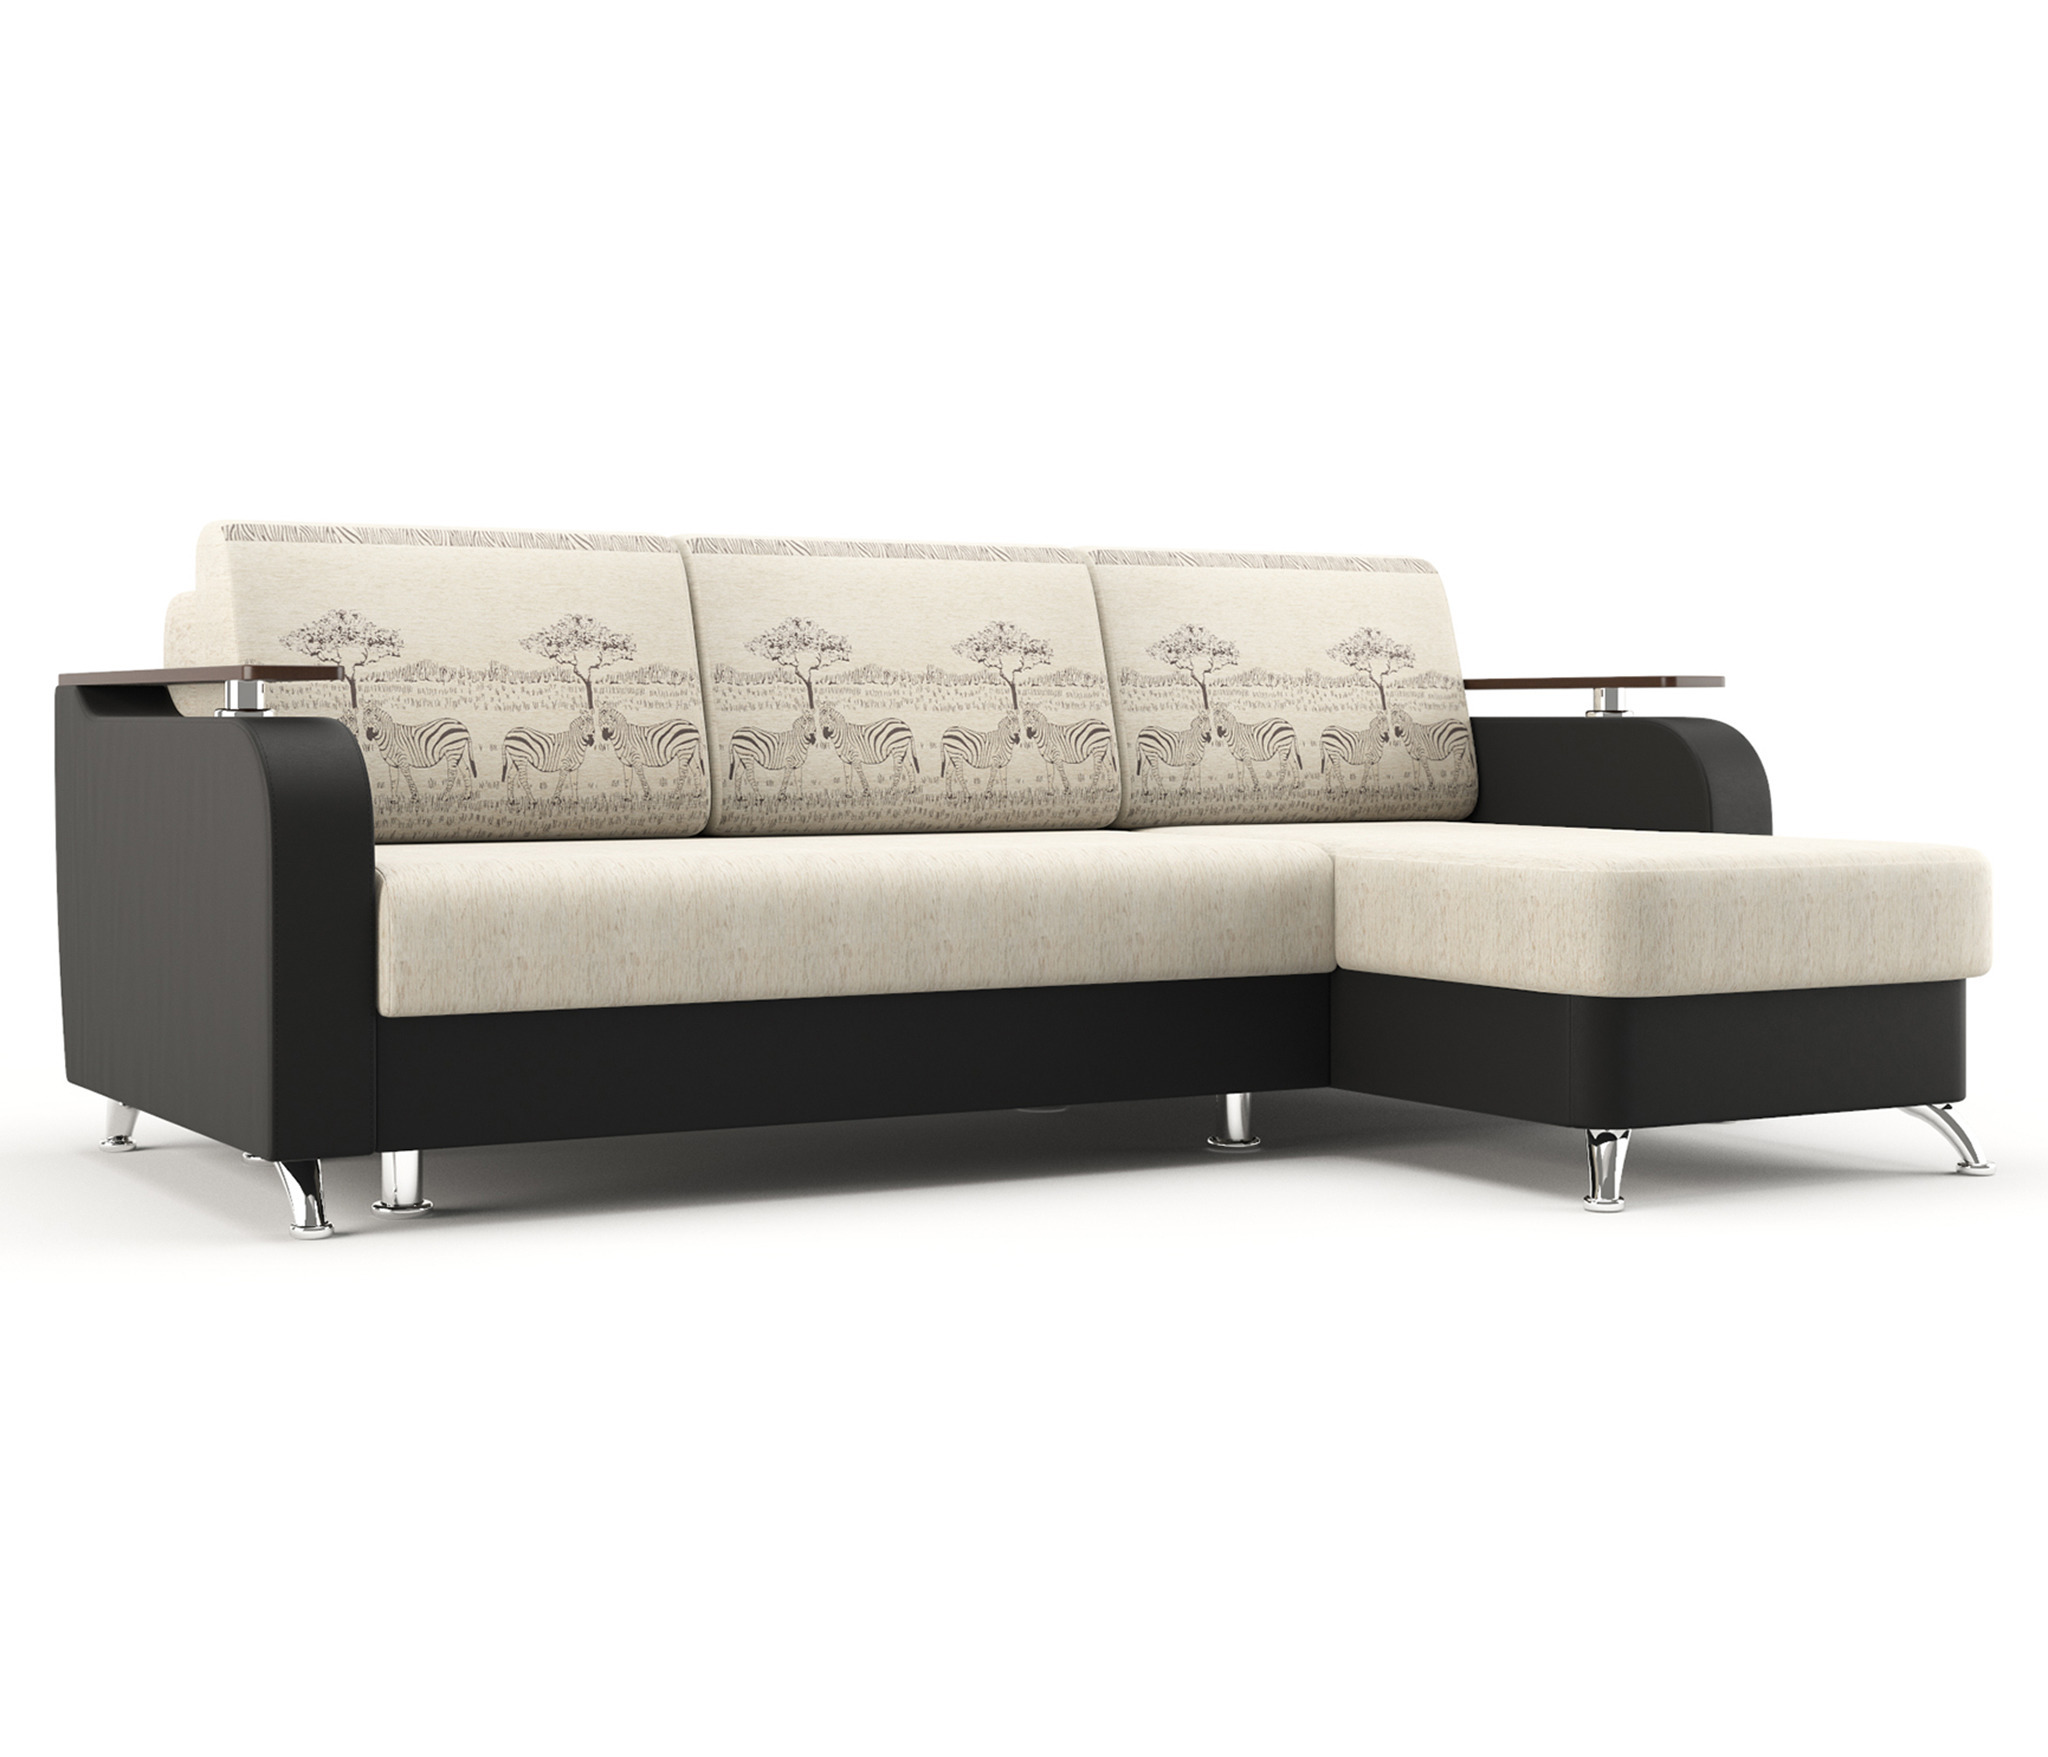 Танга диван угловой УП(Л)Мягкая мебель<br><br><br>Длина мм: 2280<br>Высота мм: 920<br>Глубина мм: 1600